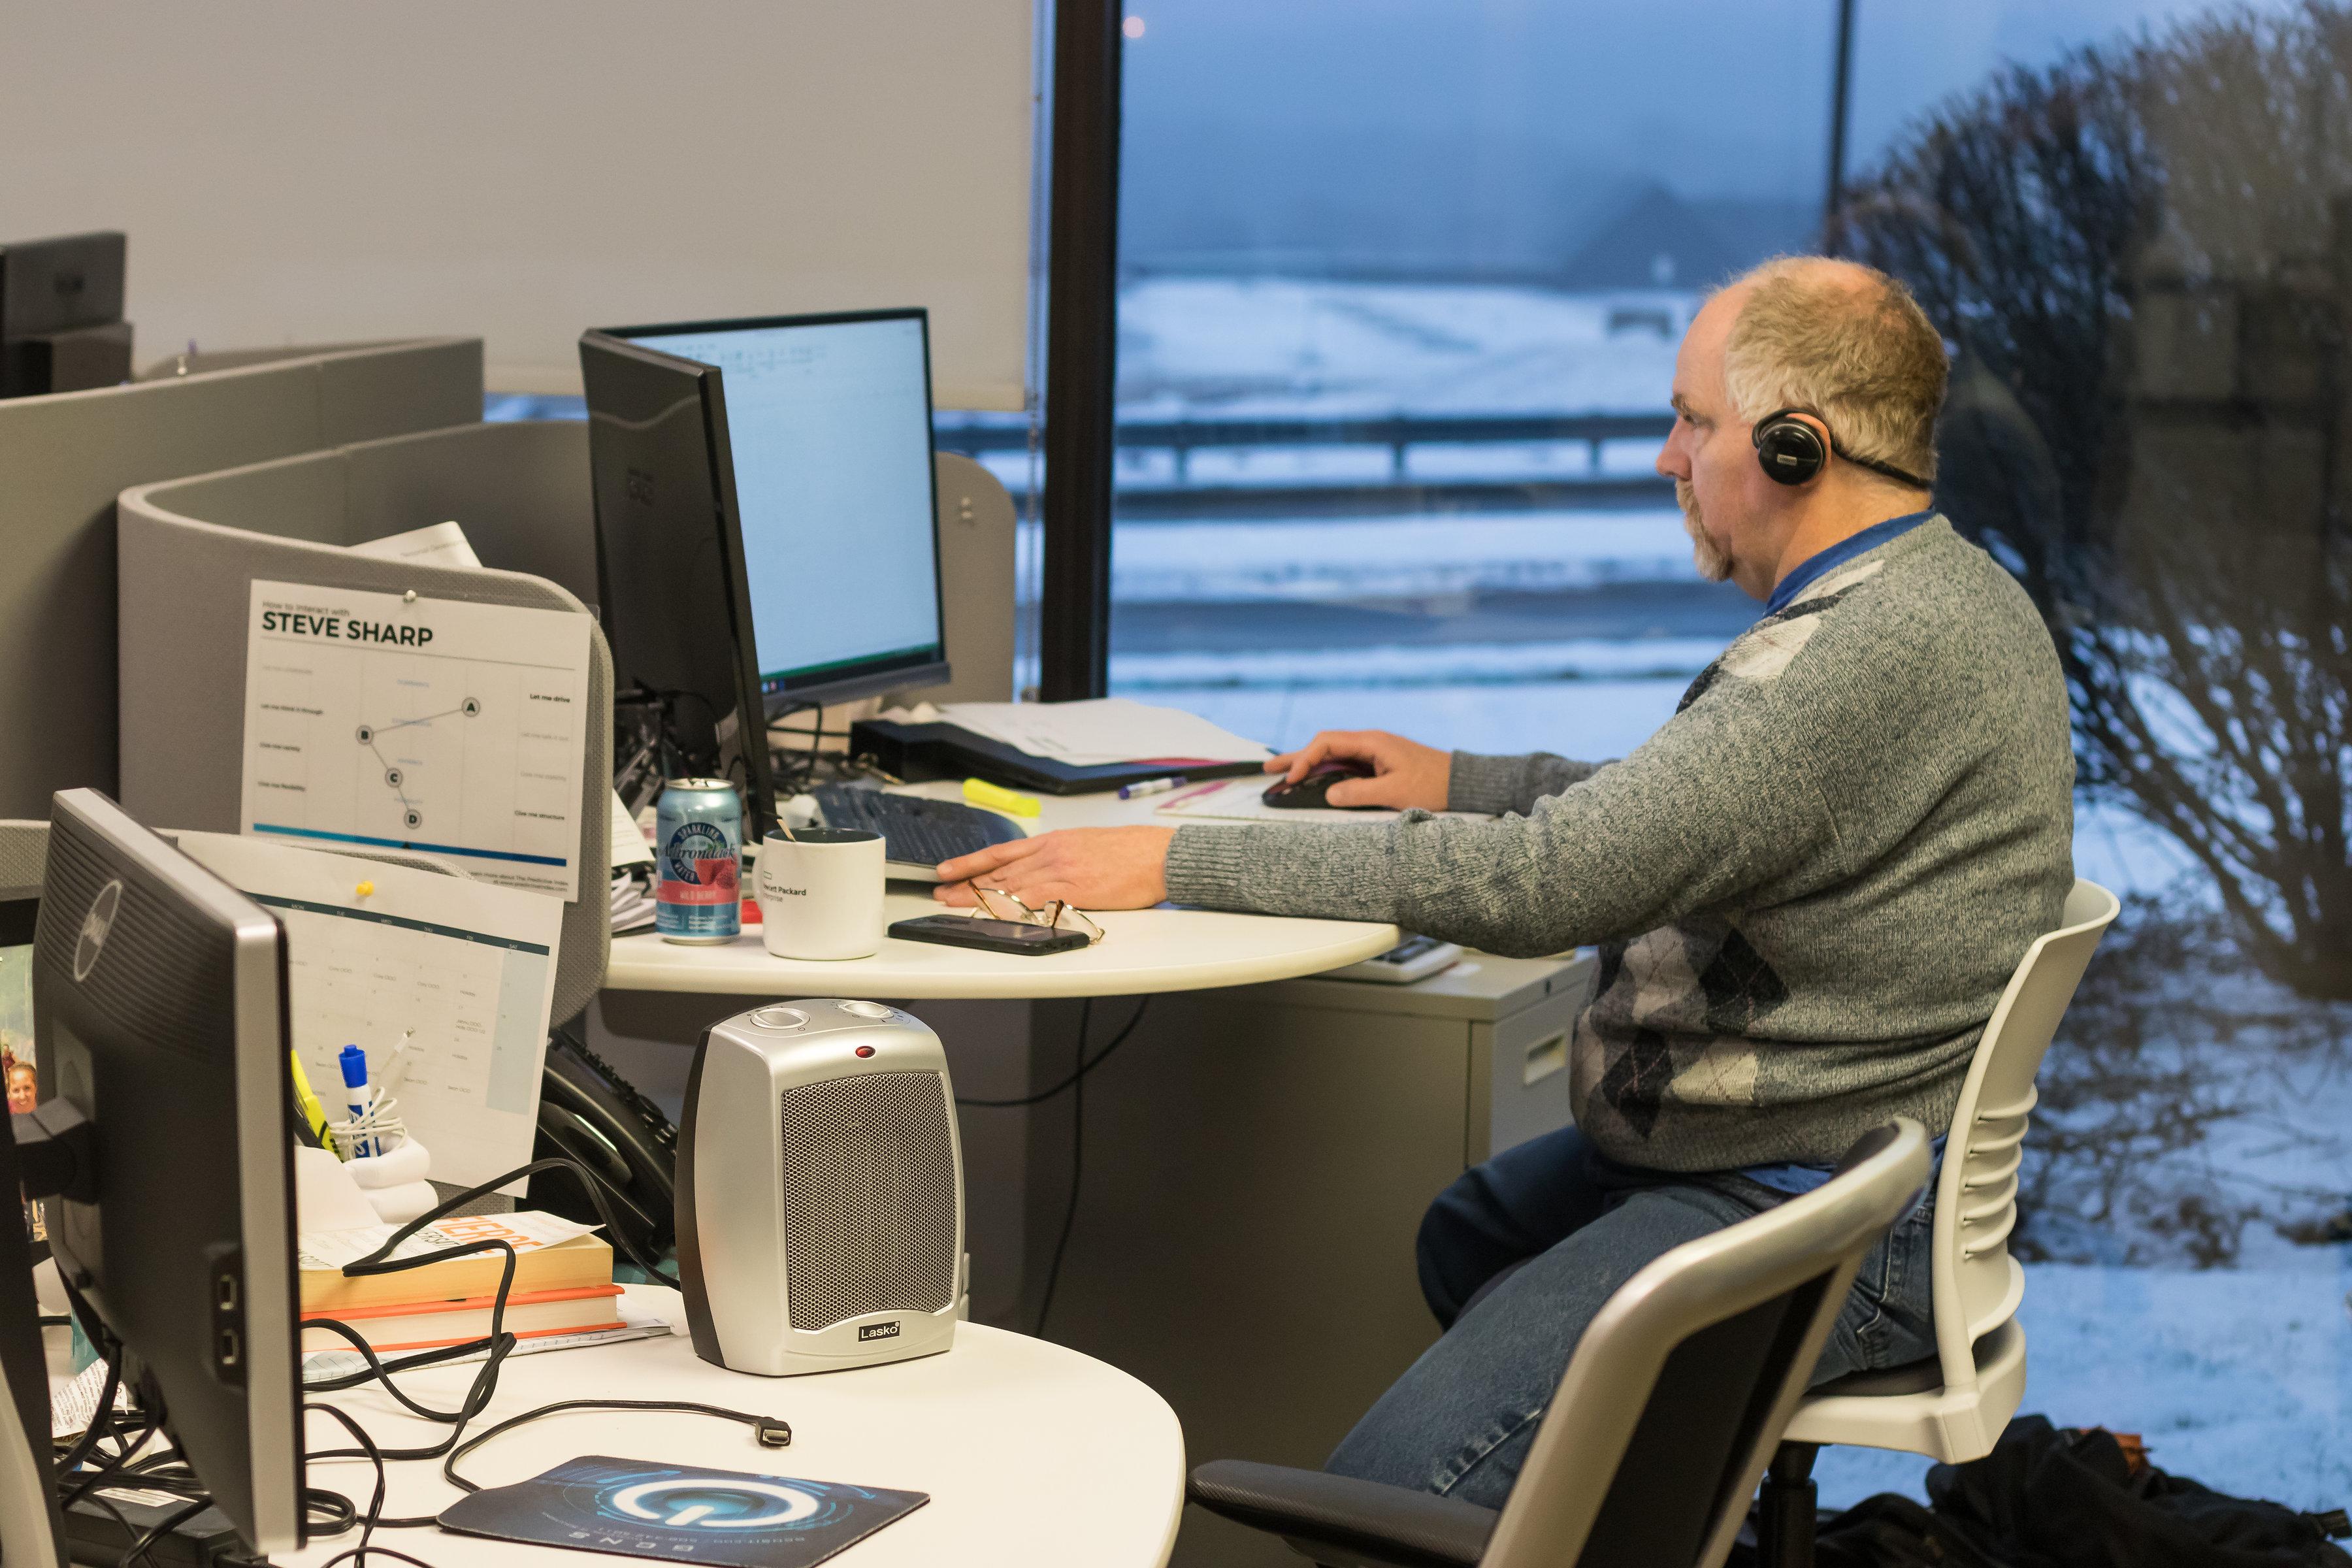 Steve hard at work